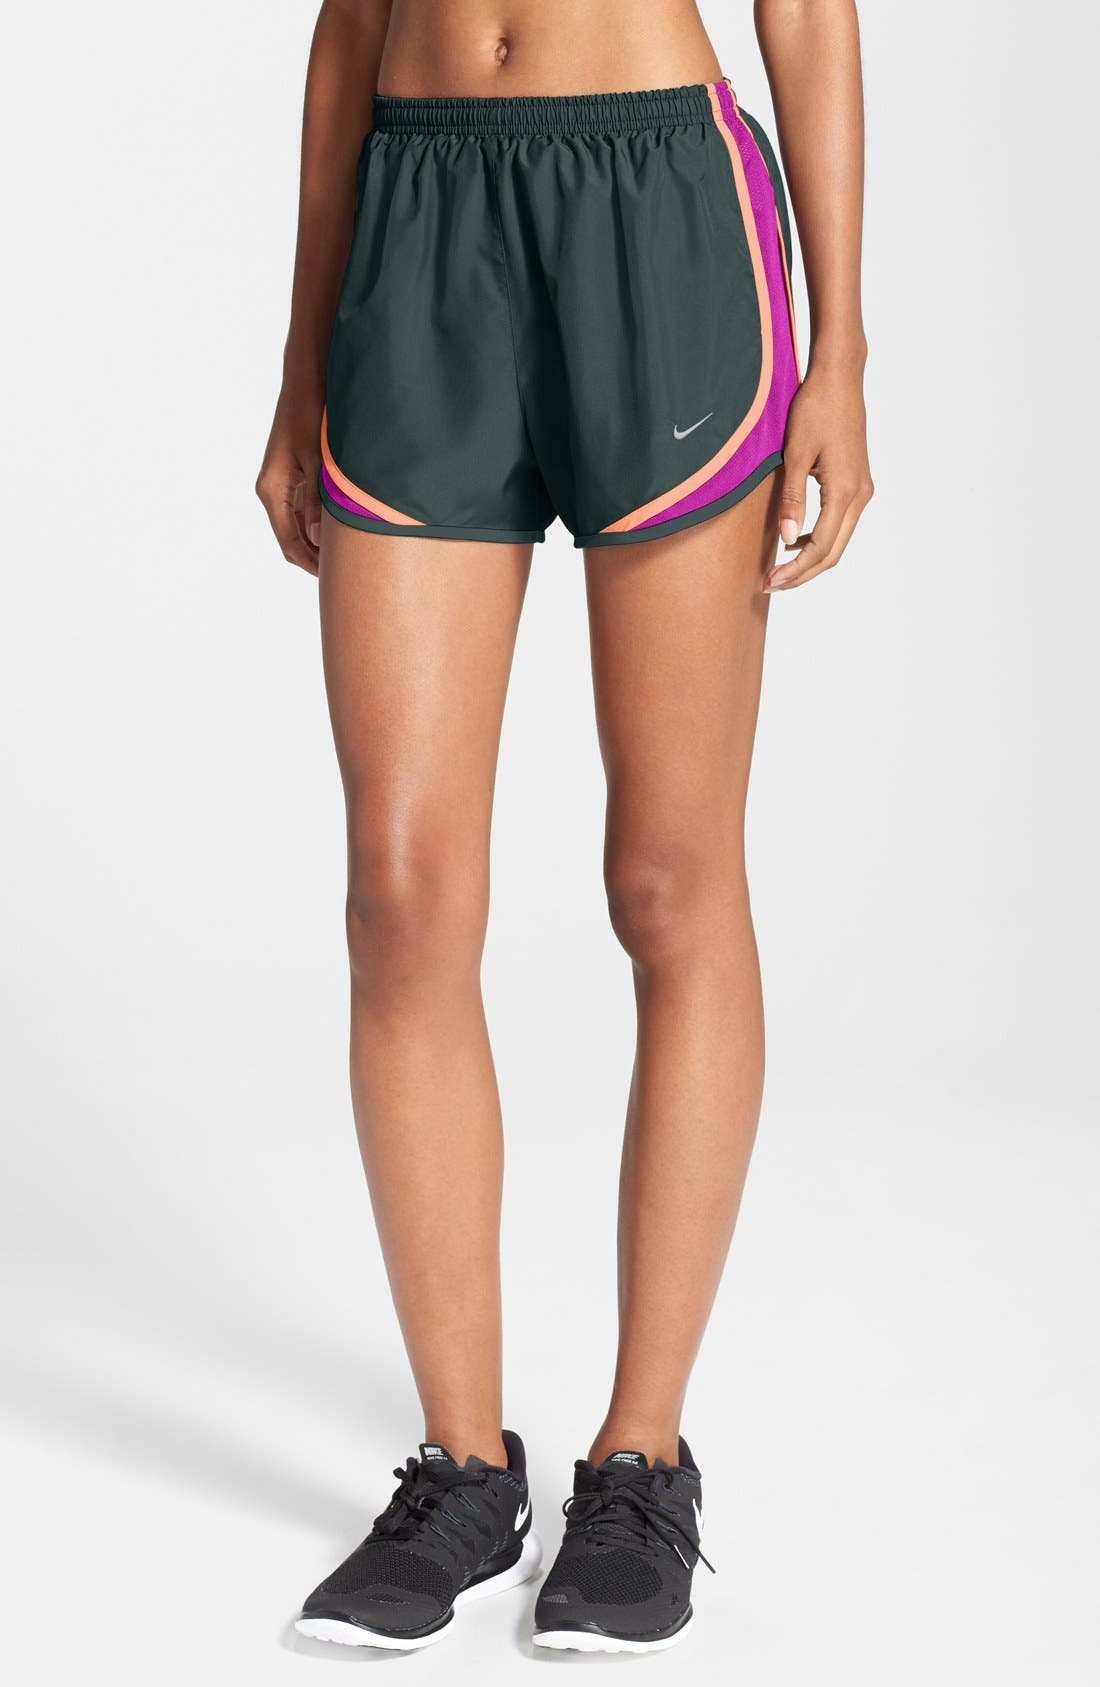 Alternate Image 1 Selected - Nike 'Tempo' Dri-FIT Running Shorts